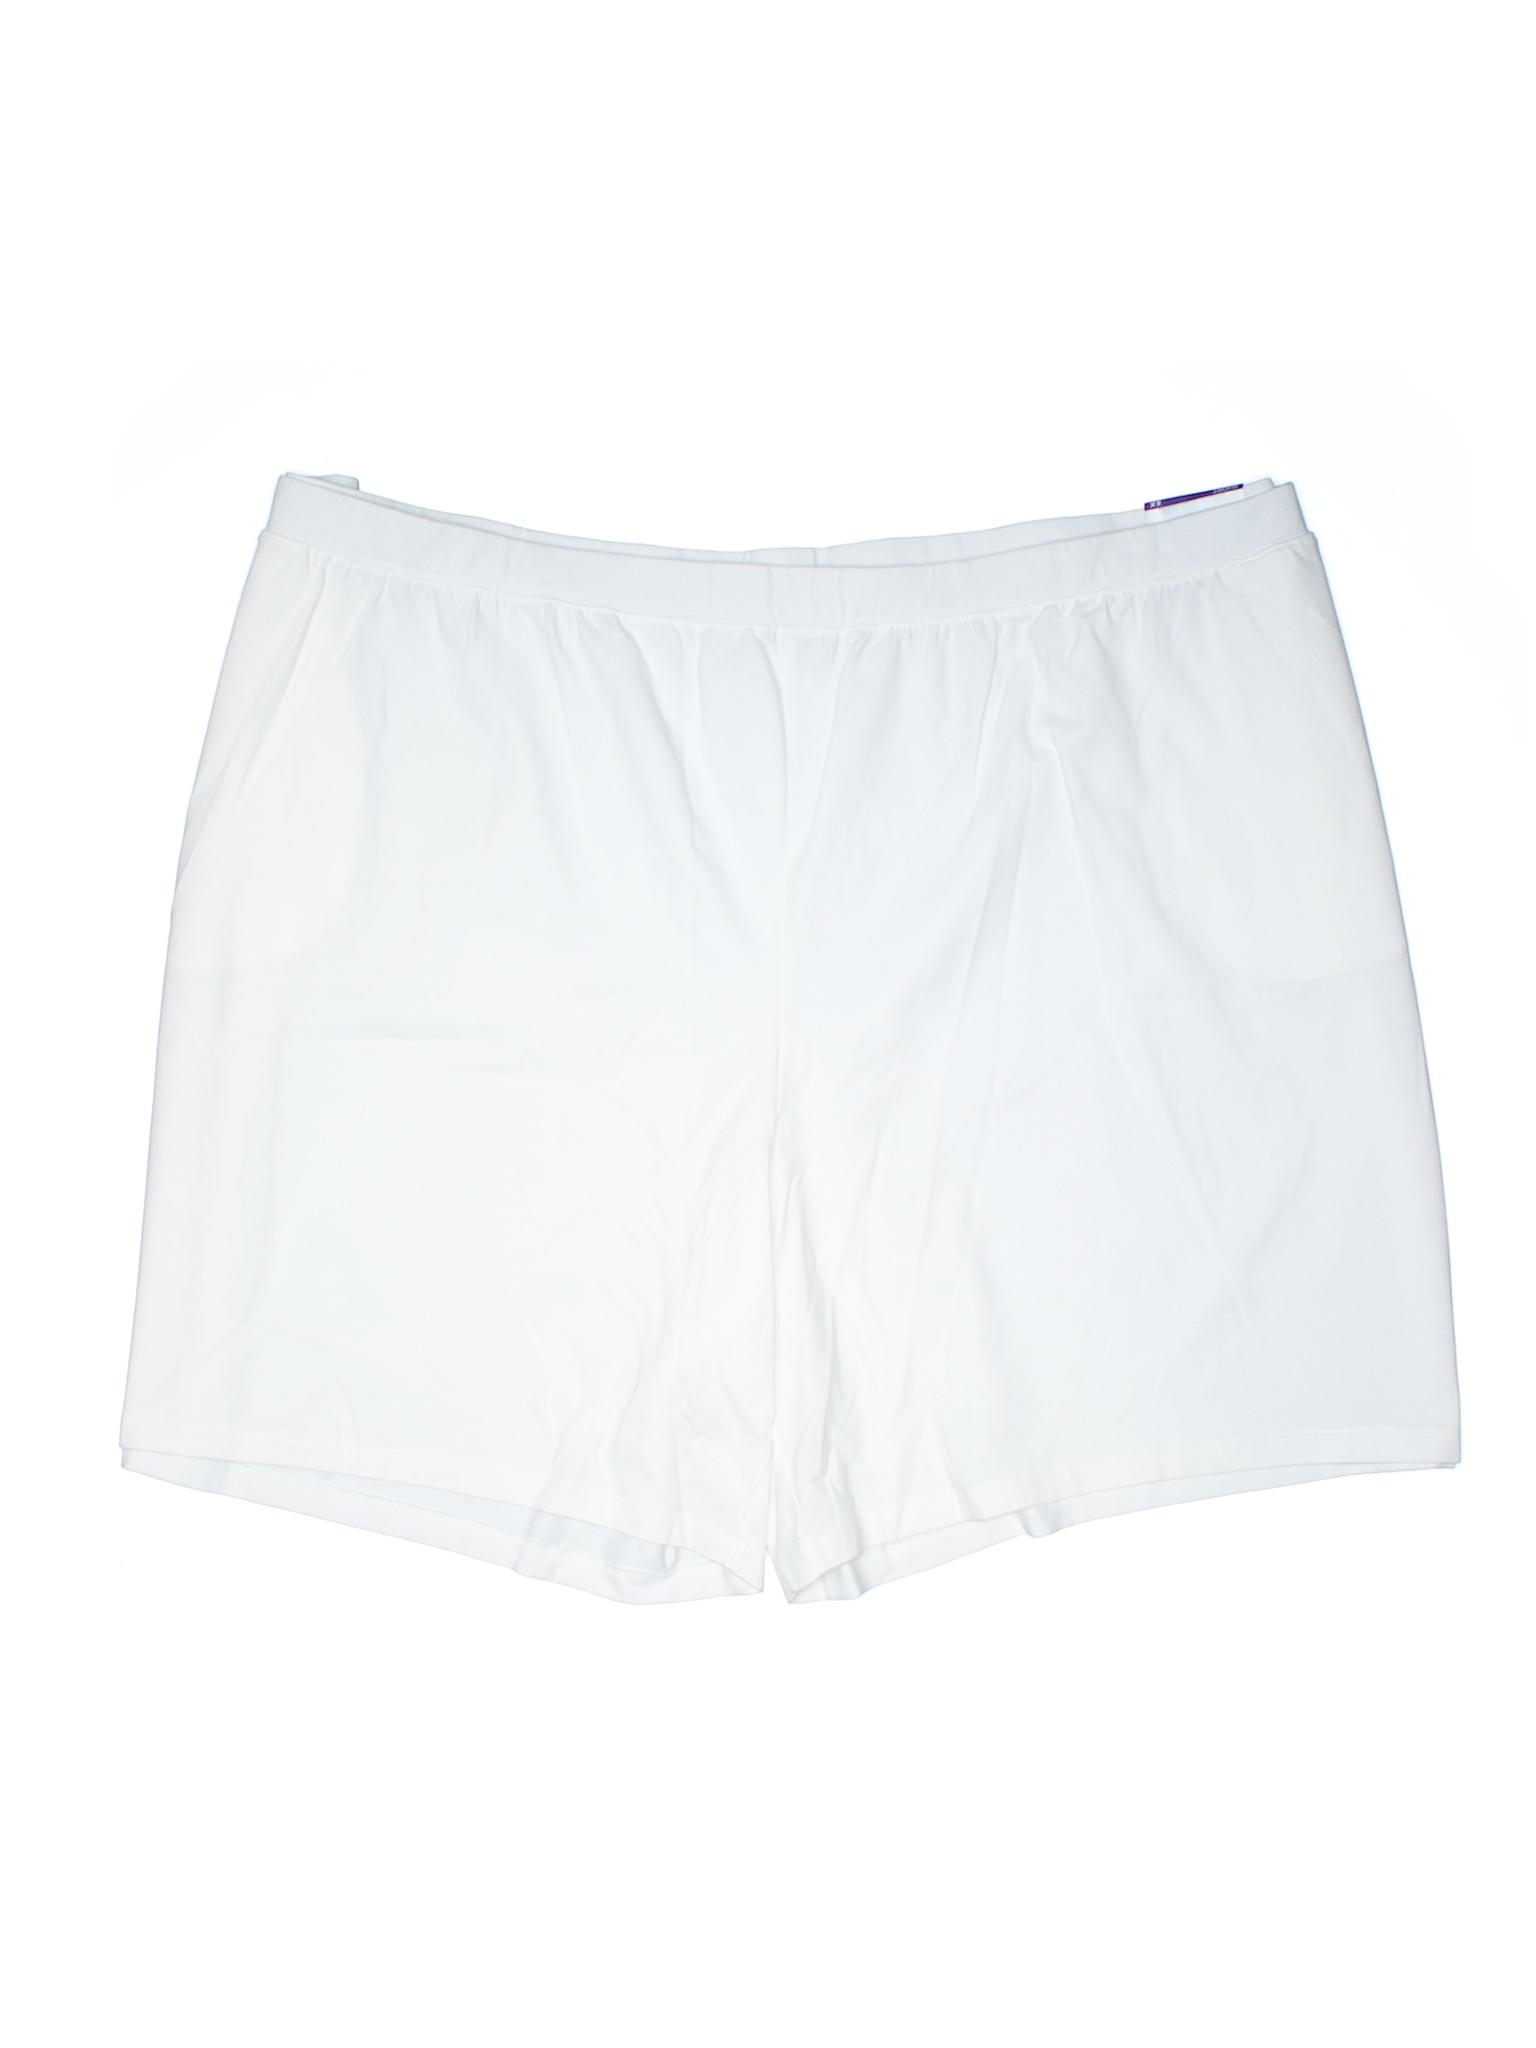 Shorts by Catherines SUPREMA Essentials Boutique PqUIRR